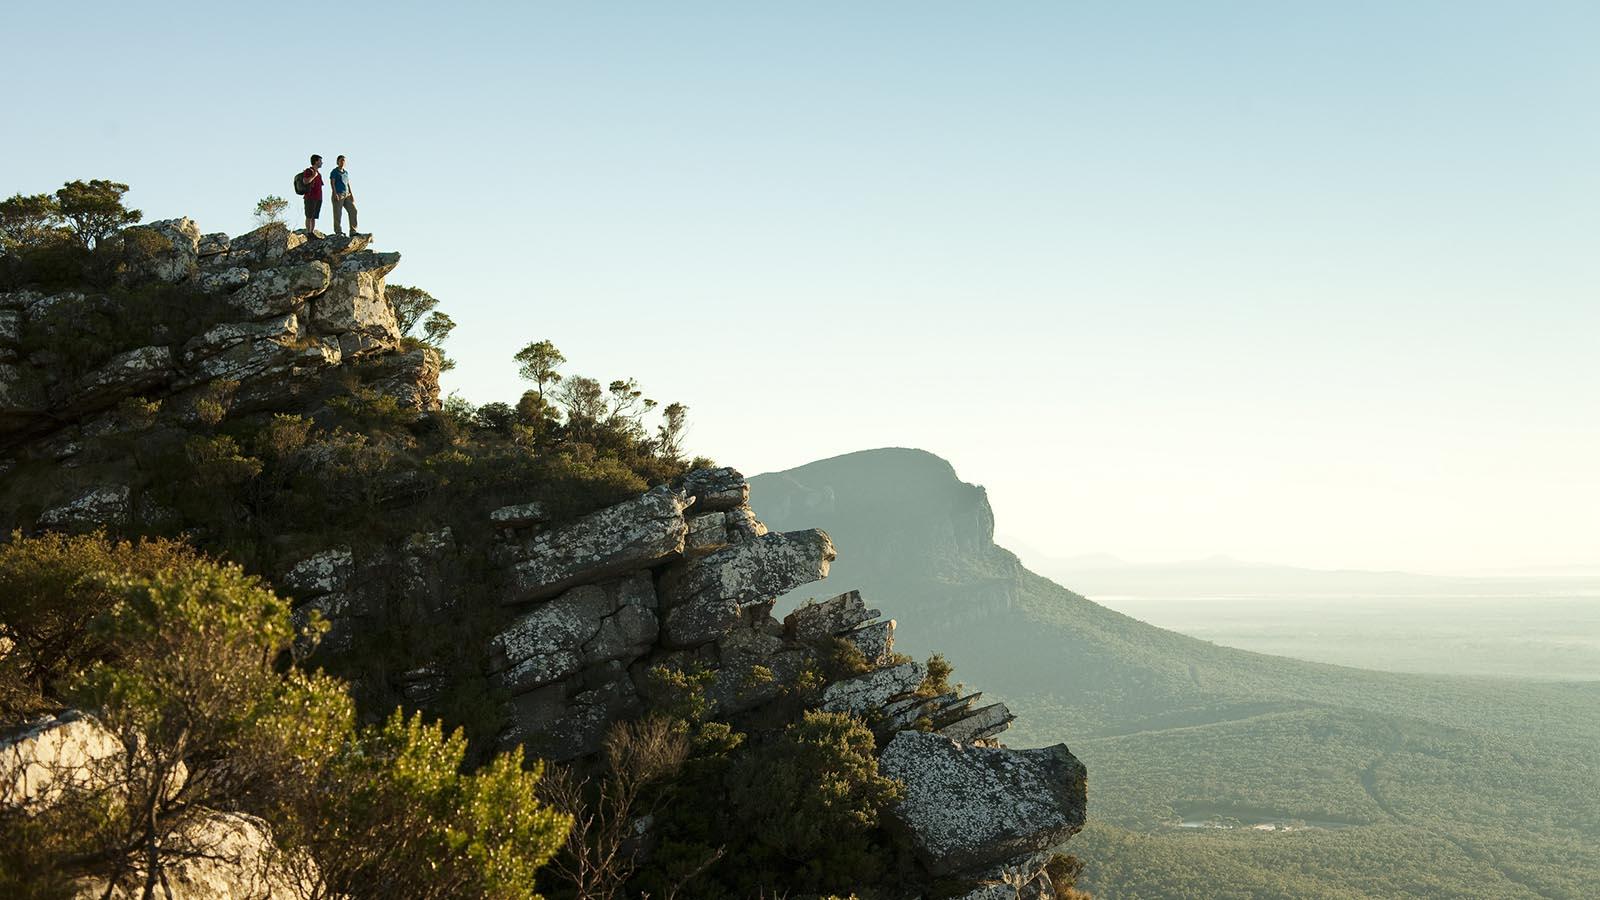 Mount Sturgeon, Grampians National Park, Grampians, Victoria, Australia